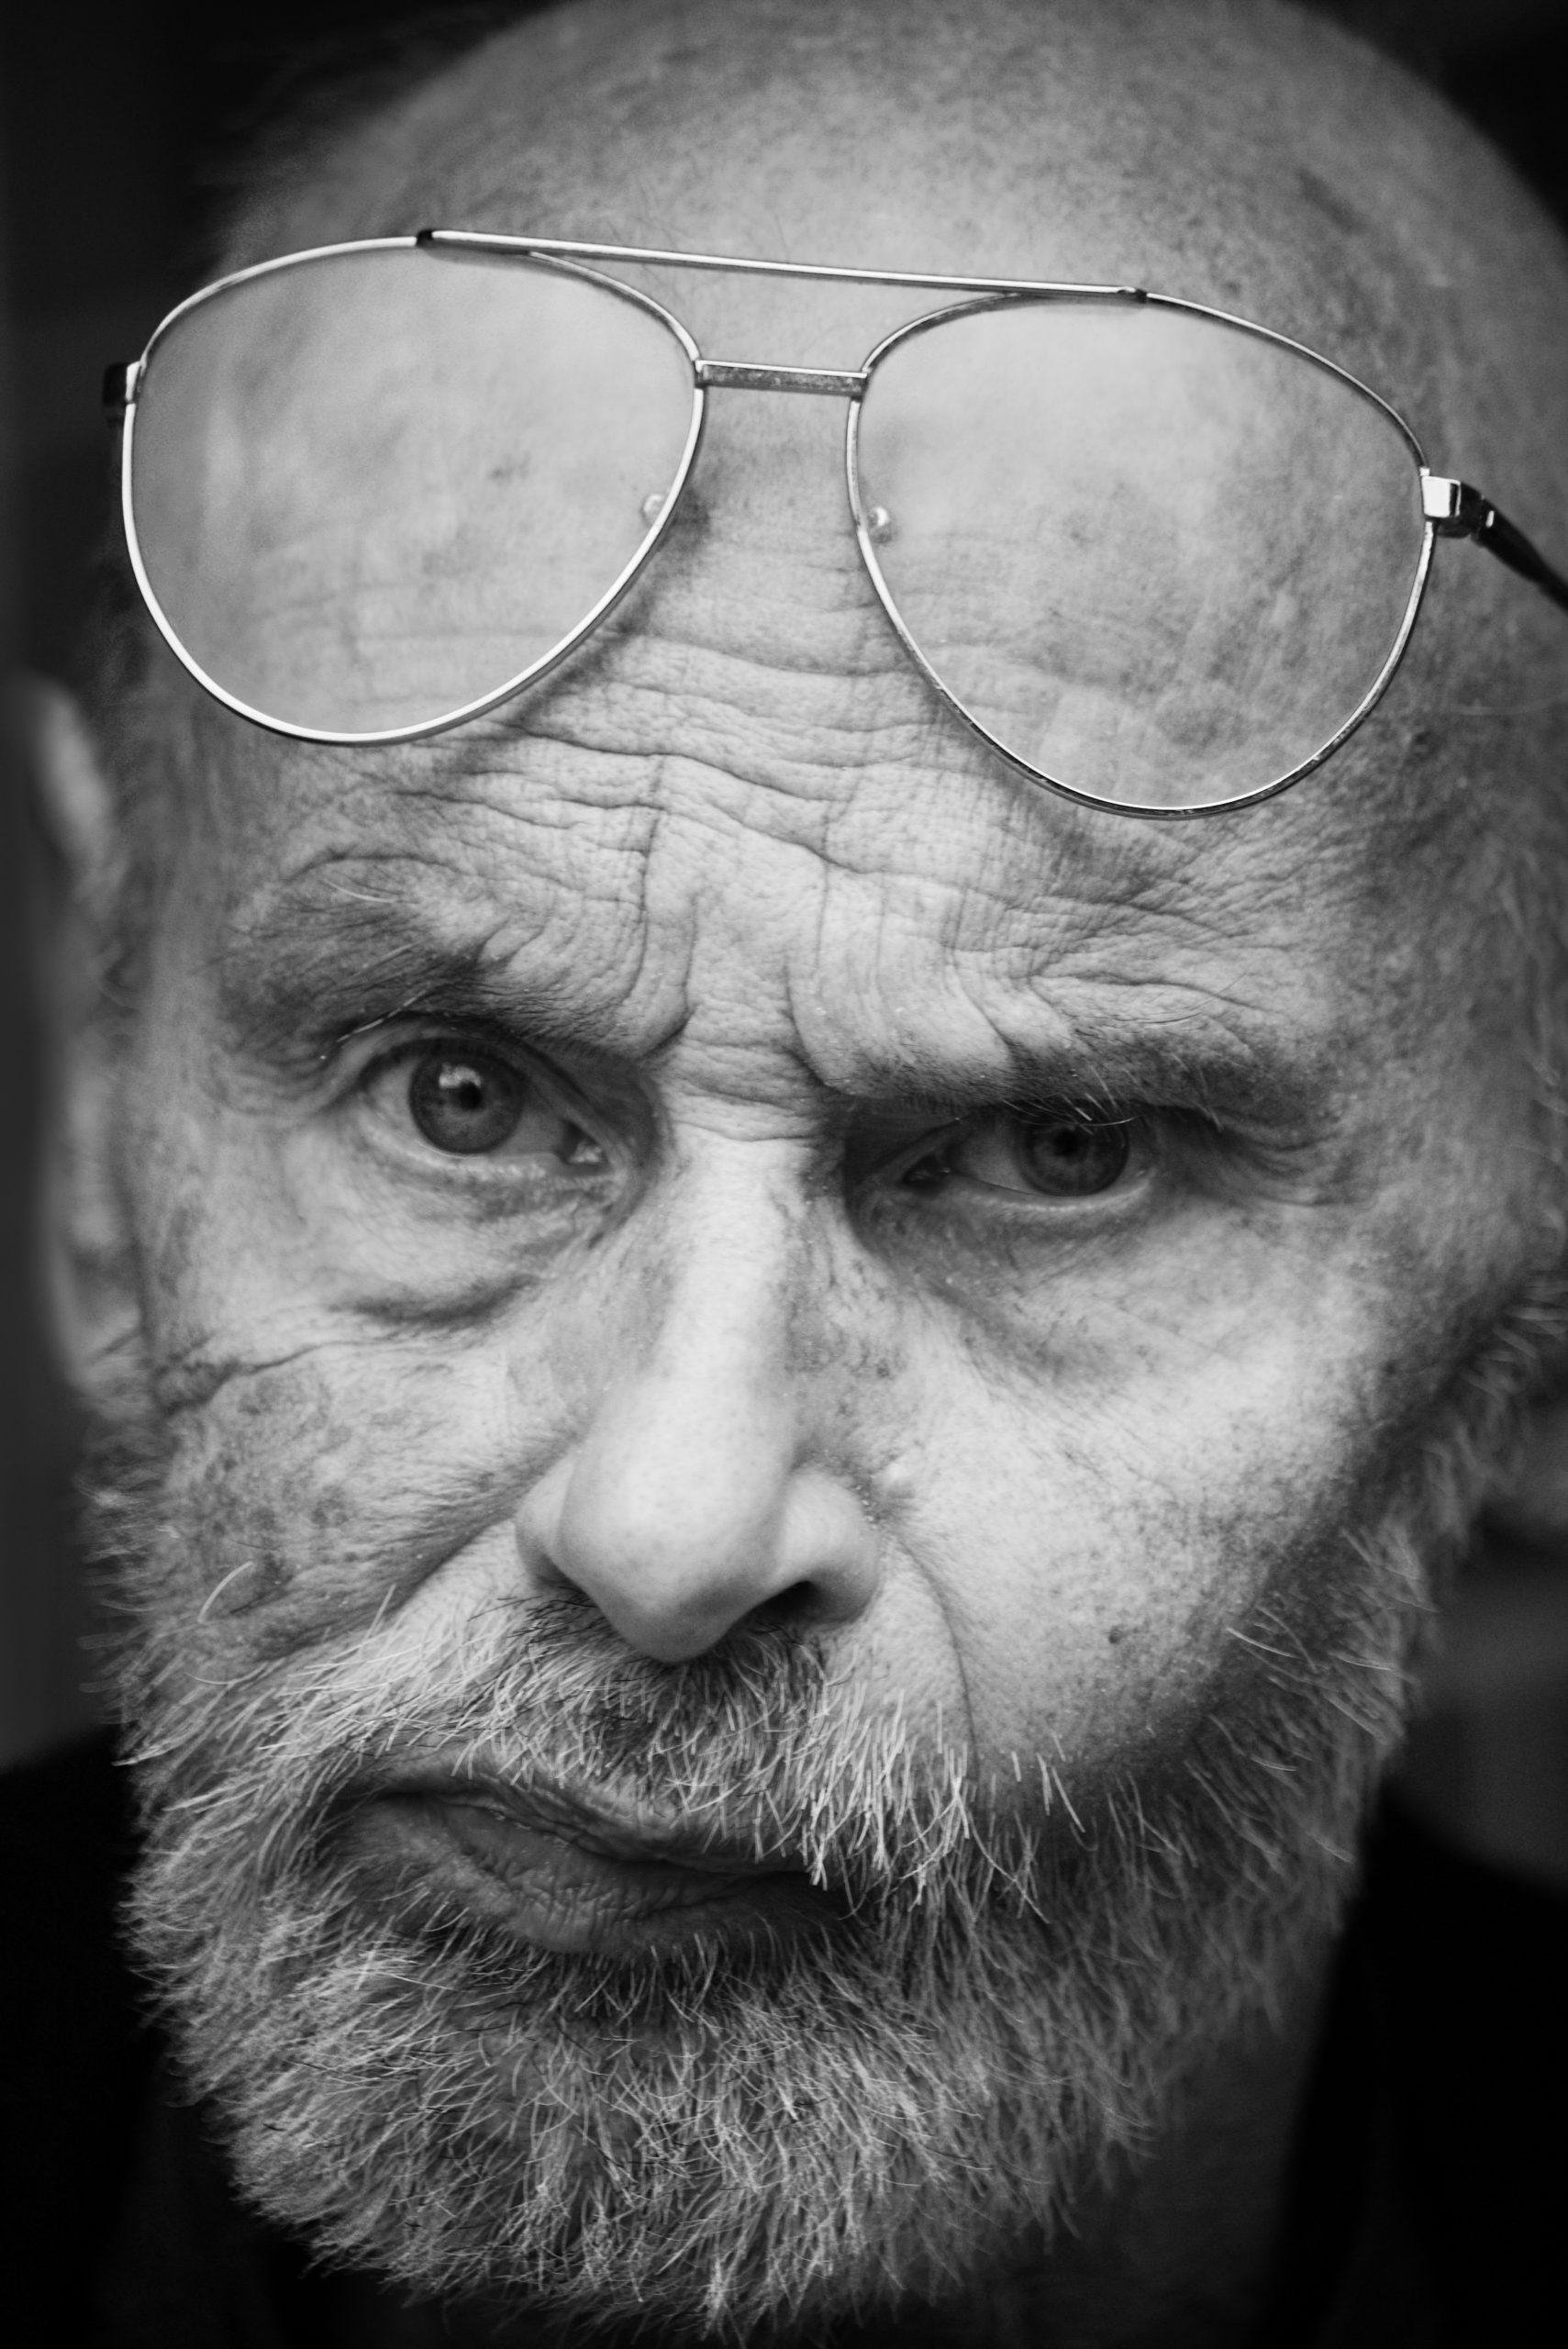 Vlado Baltuškevičiaus portretas.